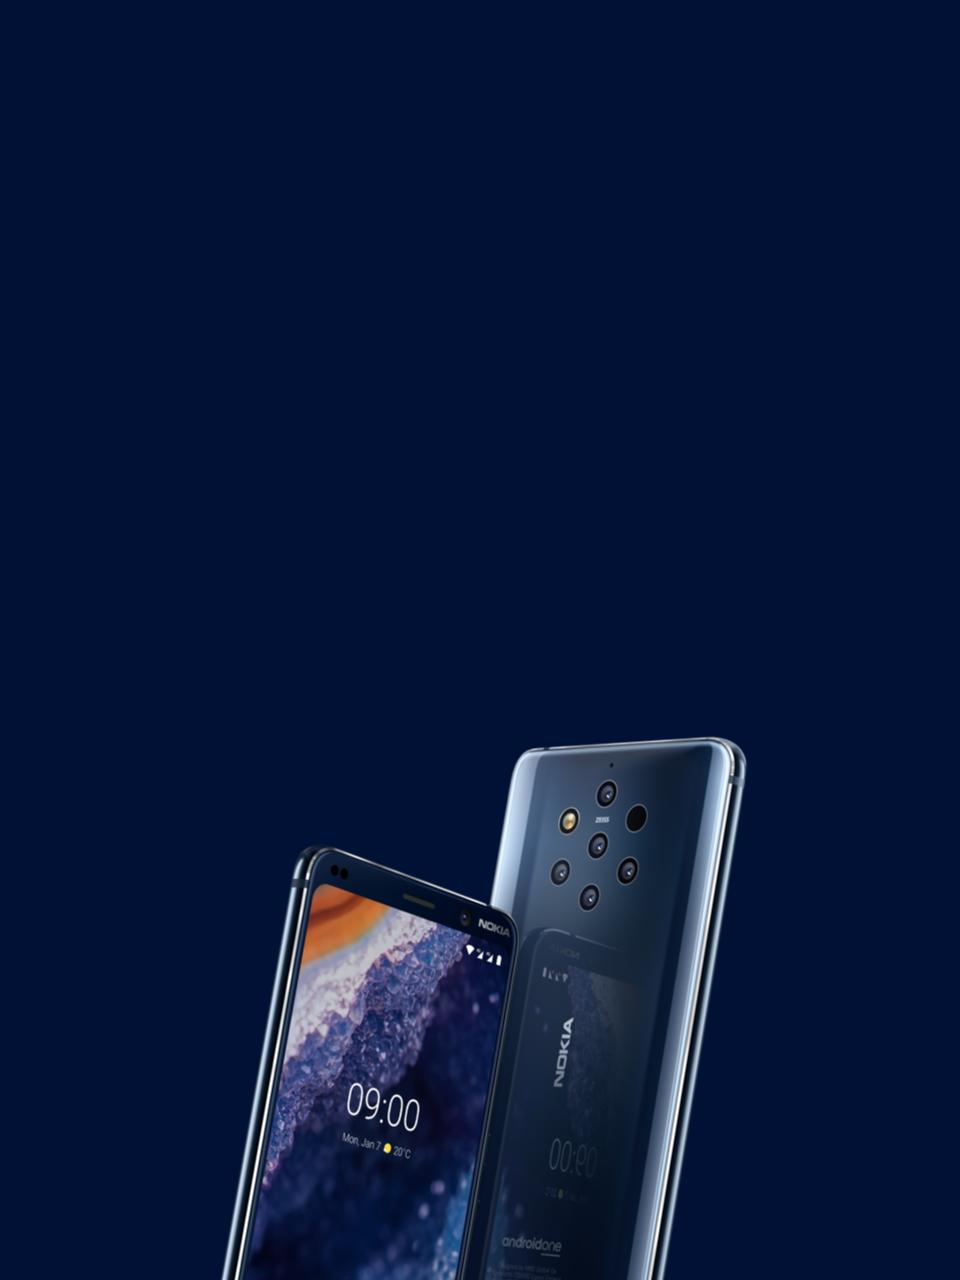 Nokia 9 Pureview Nokia Phones United States English